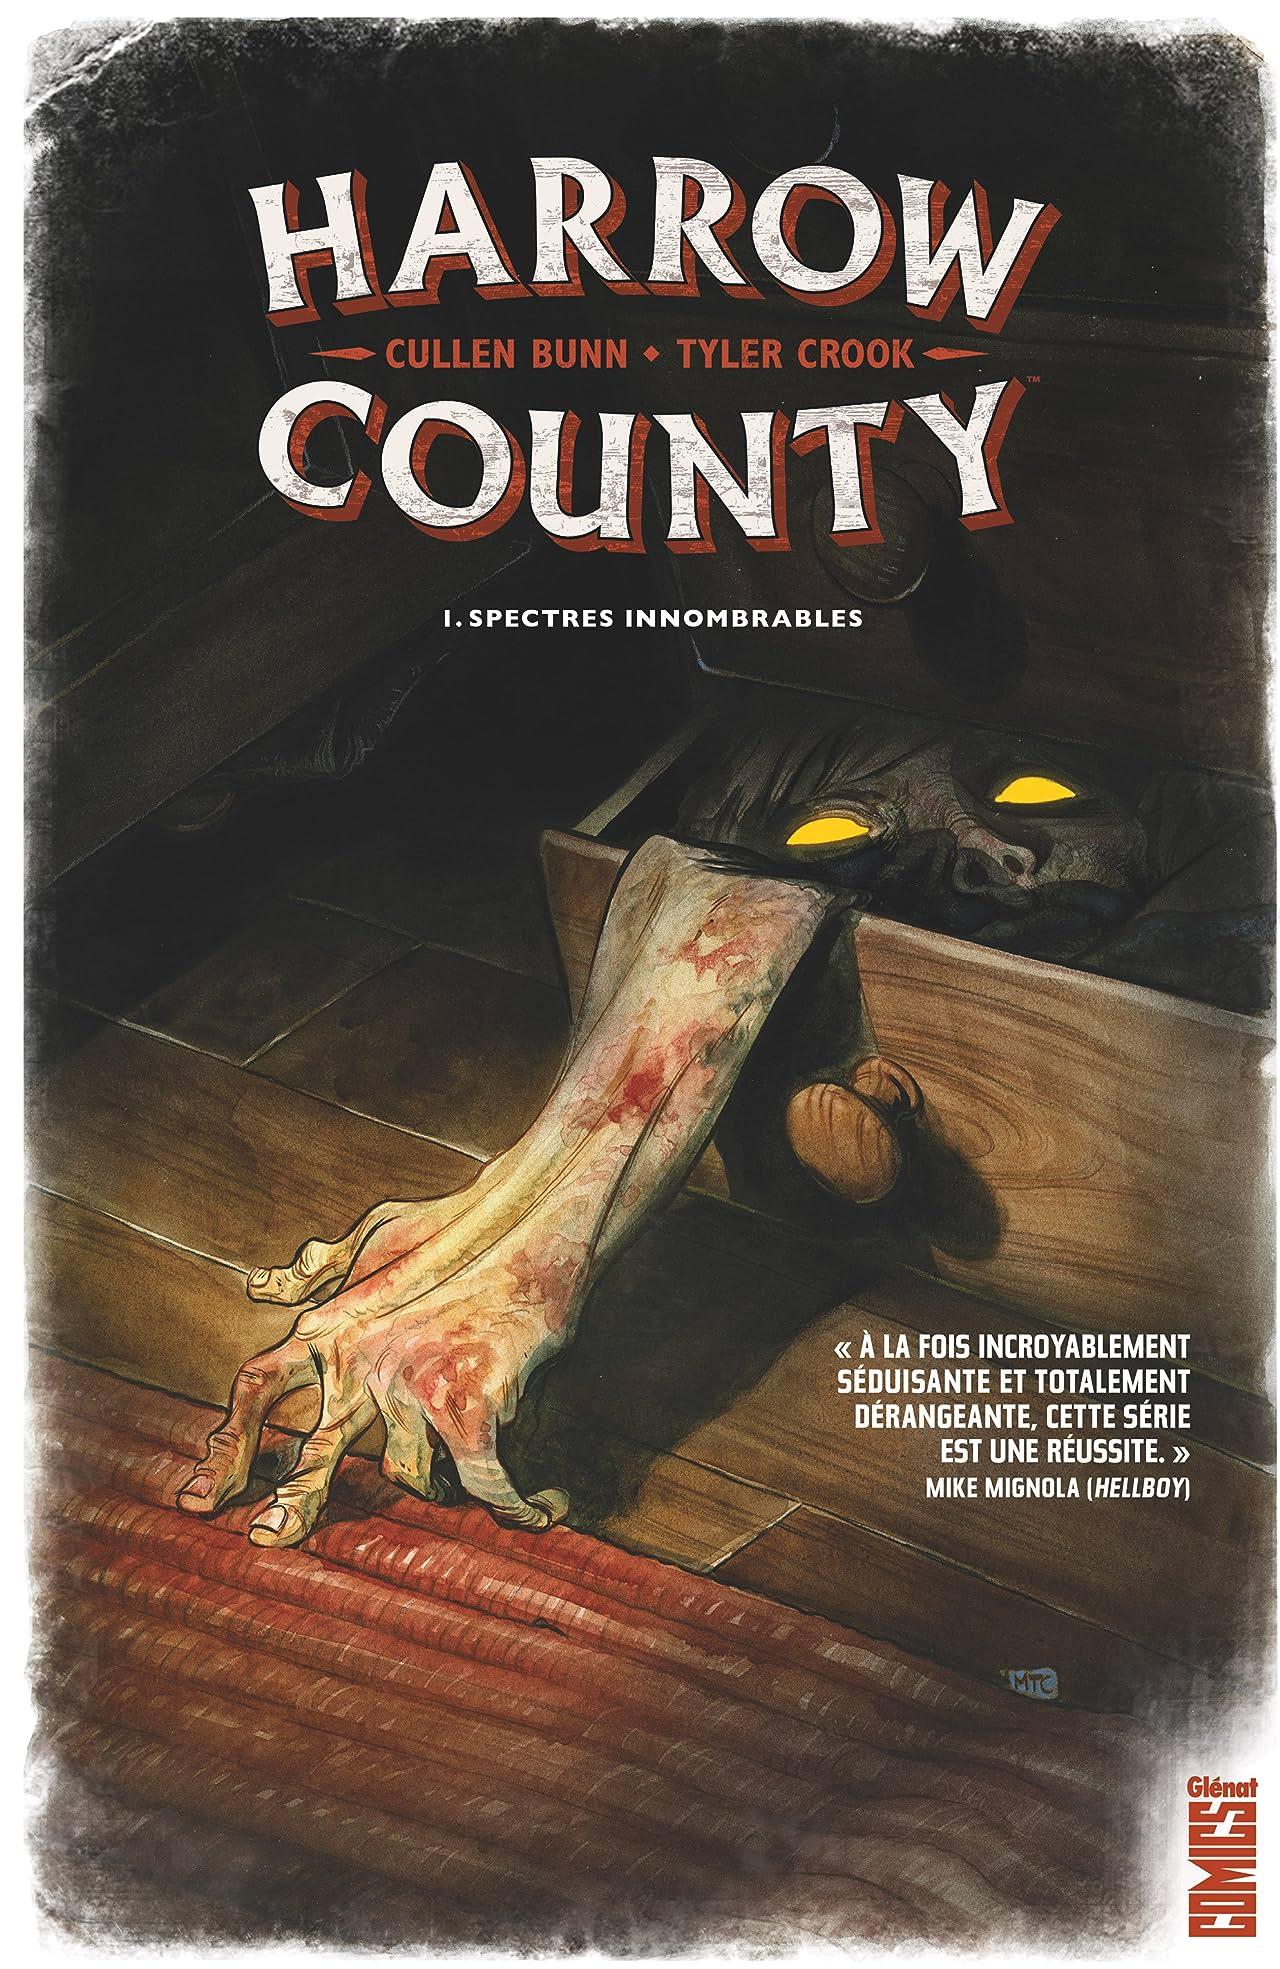 Harrow County Vol. 1: Spectres innombrables